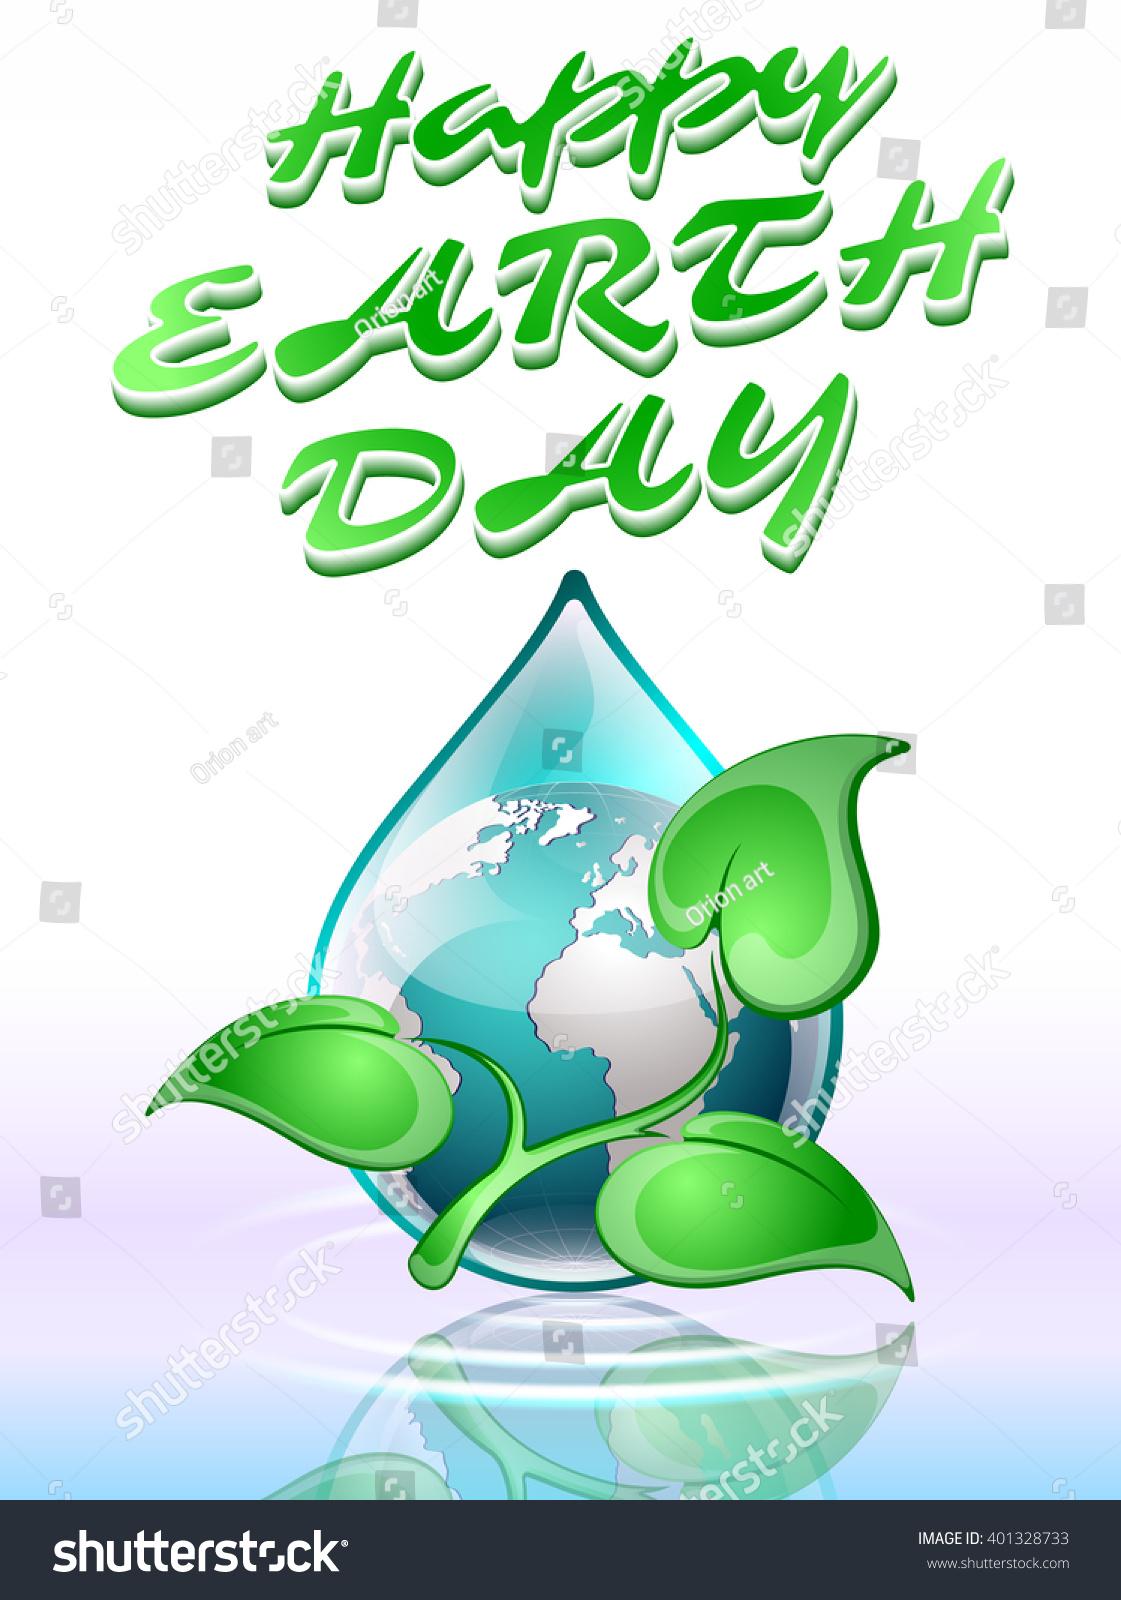 earth day vector illustration stock vector 401328733 shutterstock